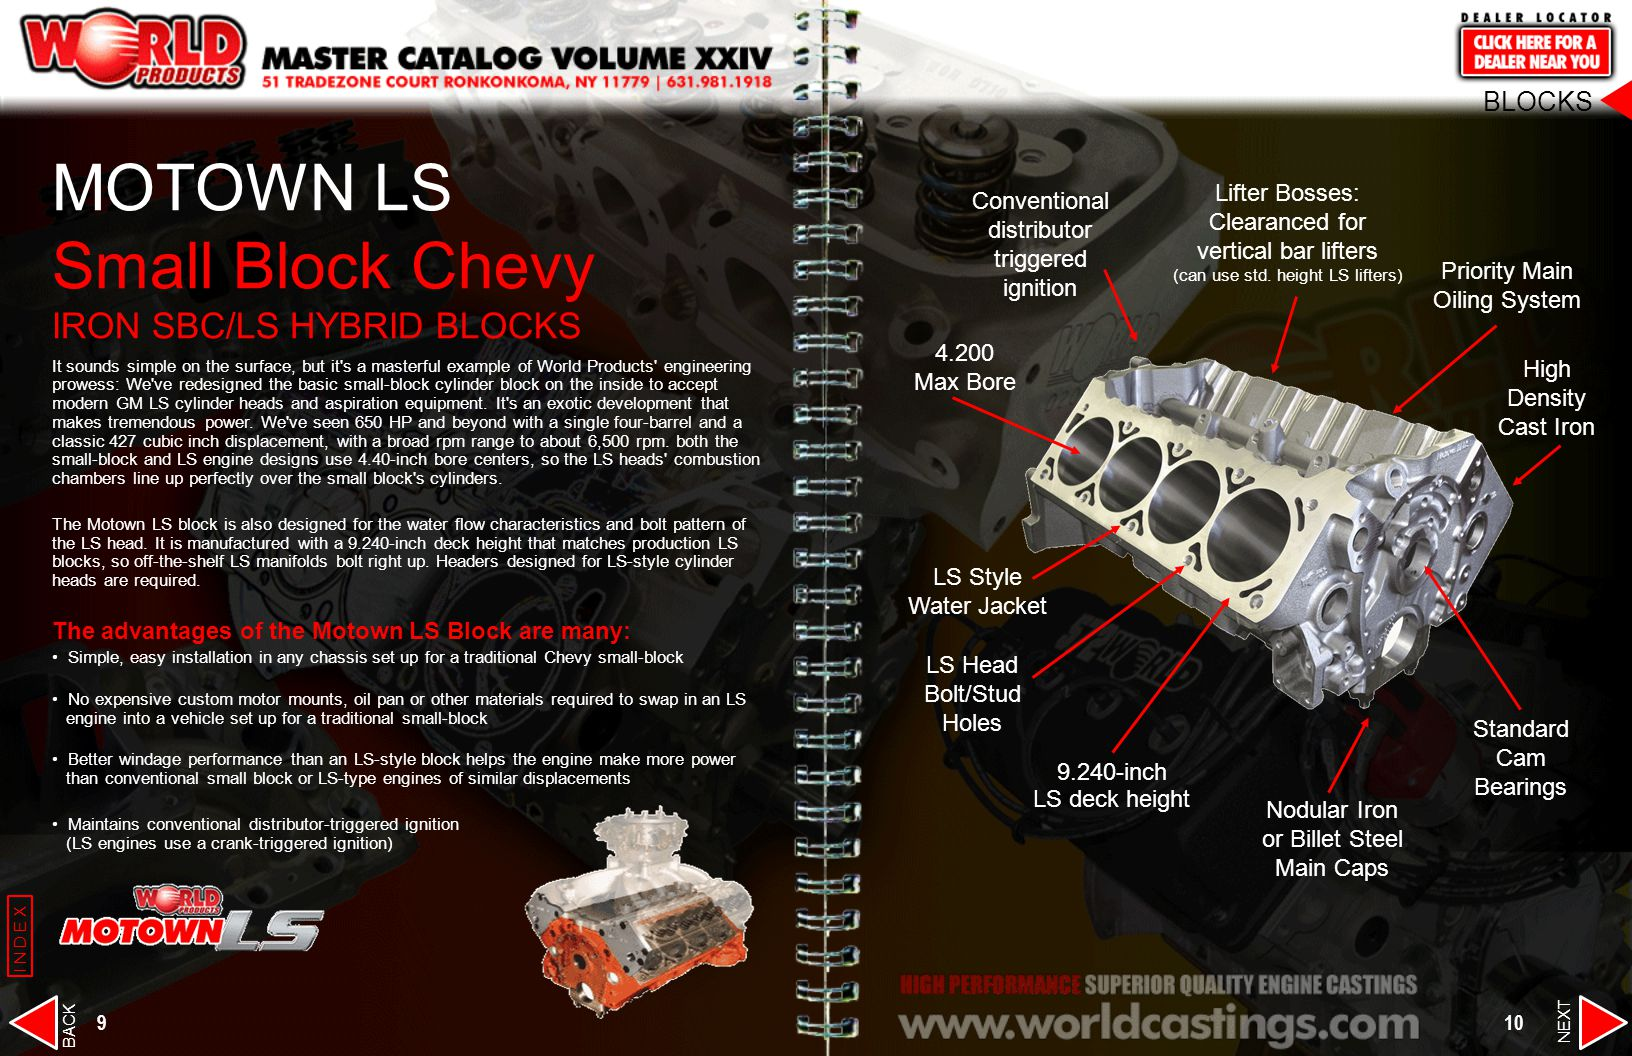 MOTOWN LS Small Block Chevy IRON SBC/LS HYBRID BLOCKS